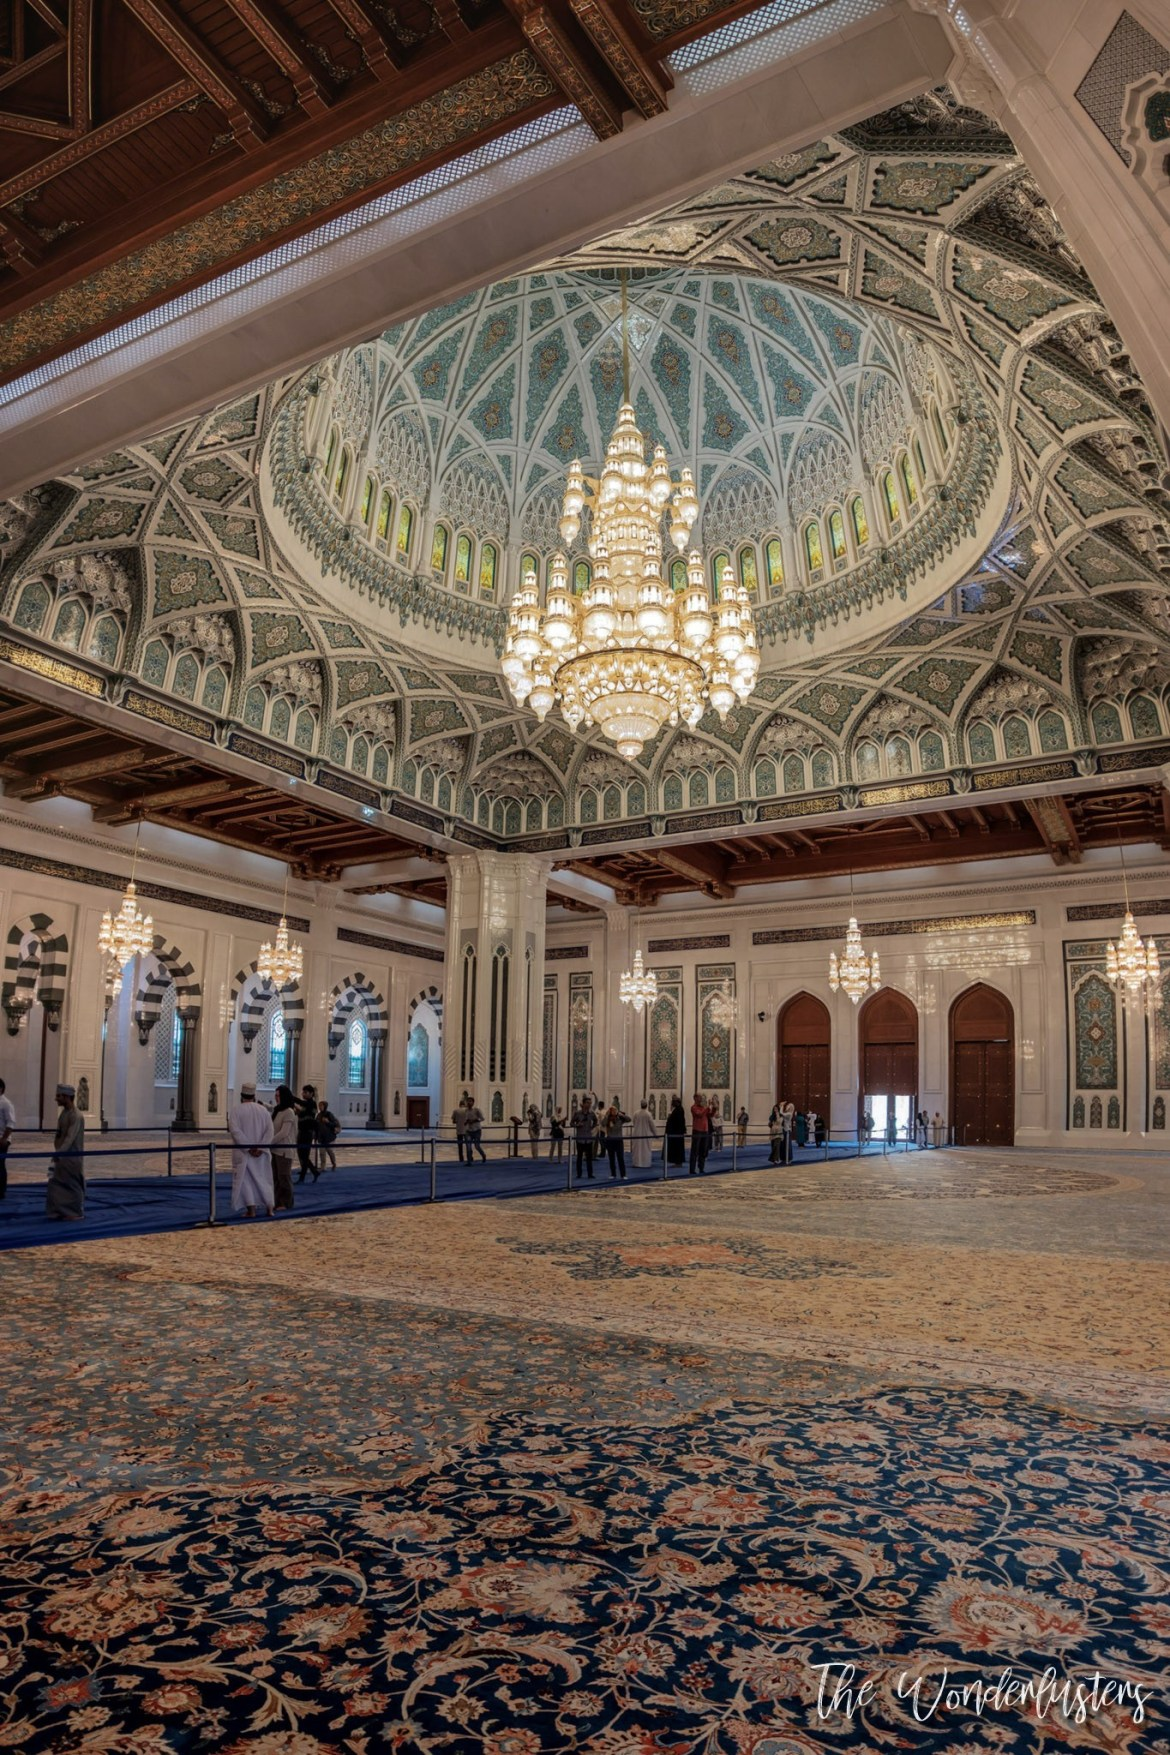 Sultan Qaboos Grand Mosque - Interior